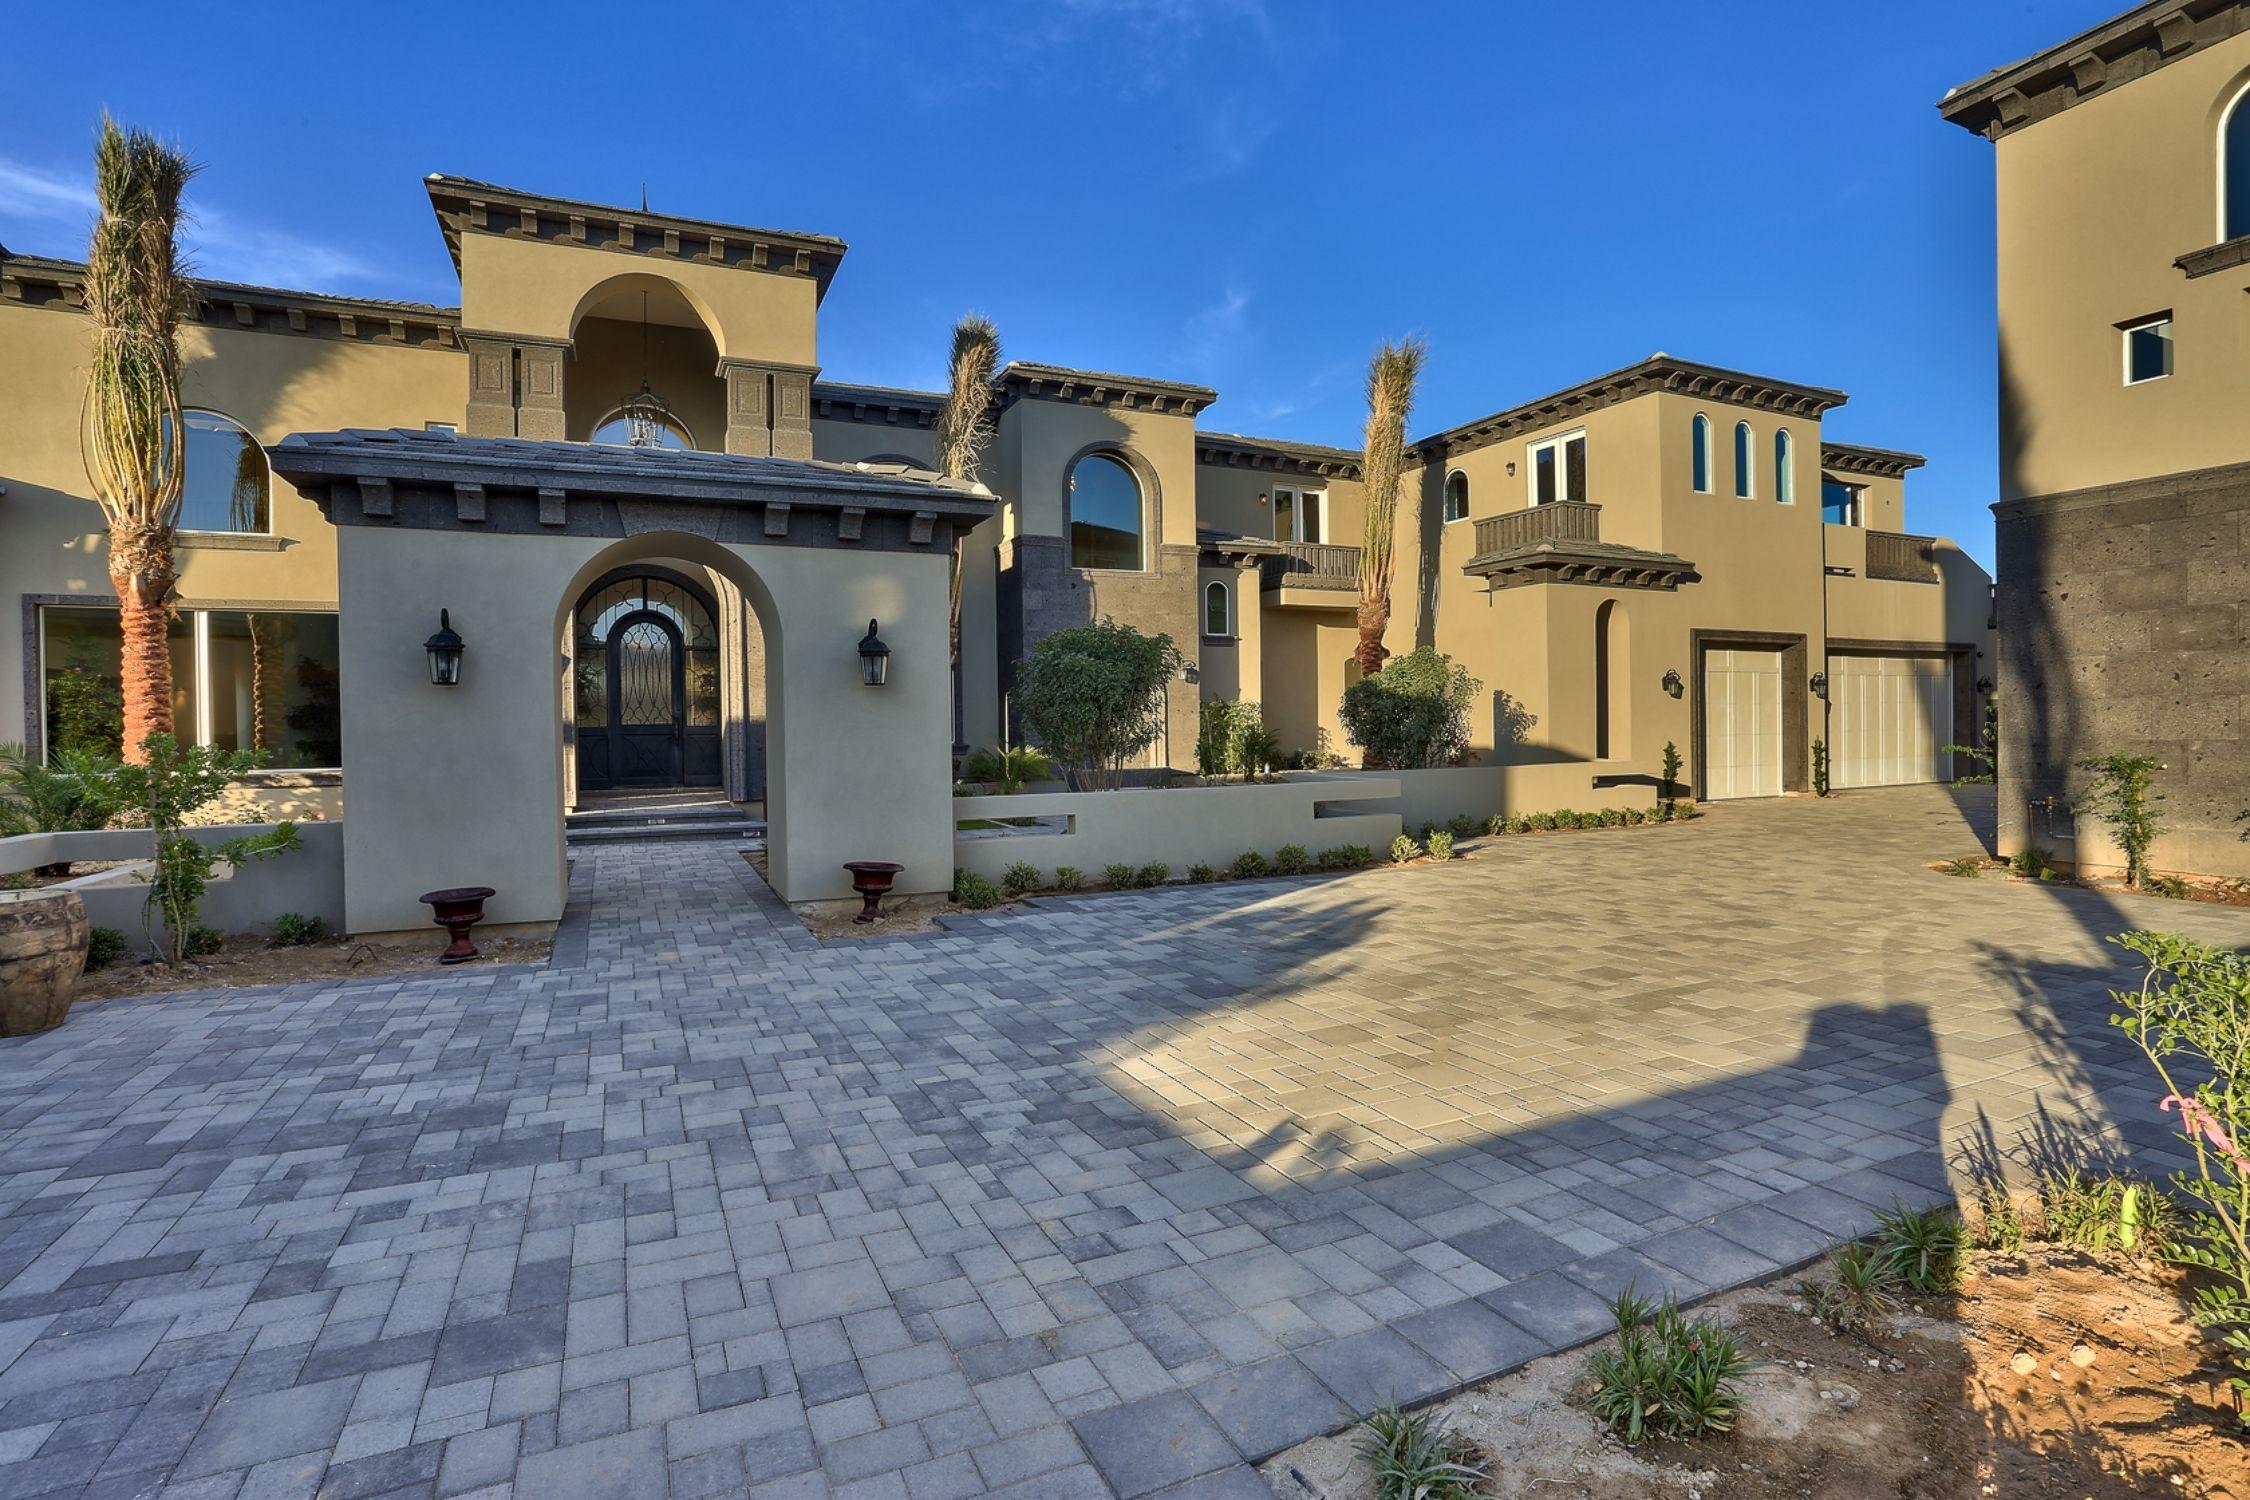 Mediterranean transitional home design front view architectural by  plan llc also rh pinterest